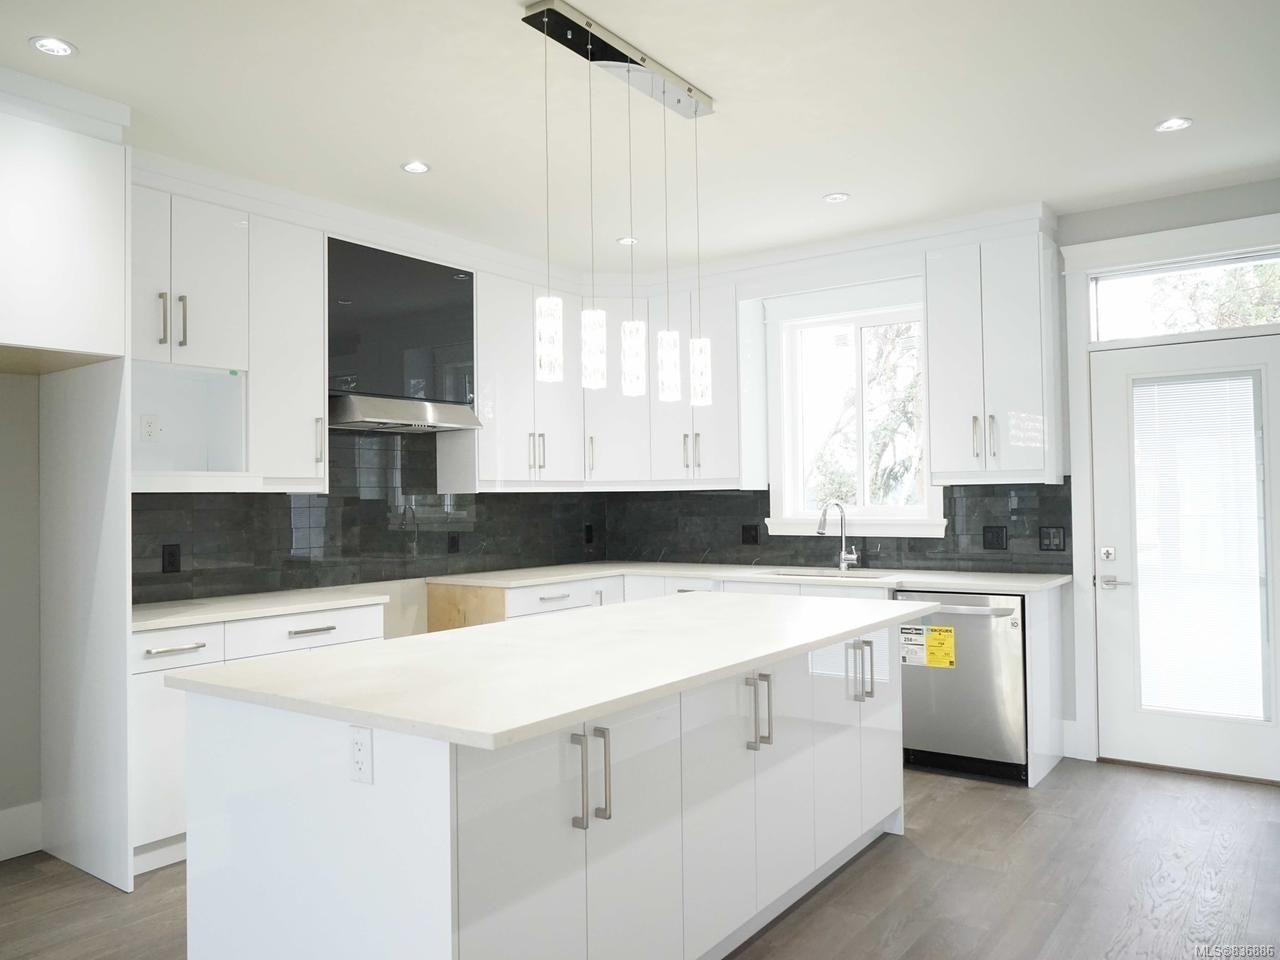 Photo 5: Photos: 123 Lindquist Rd in NANAIMO: Na North Nanaimo House for sale (Nanaimo)  : MLS®# 836886